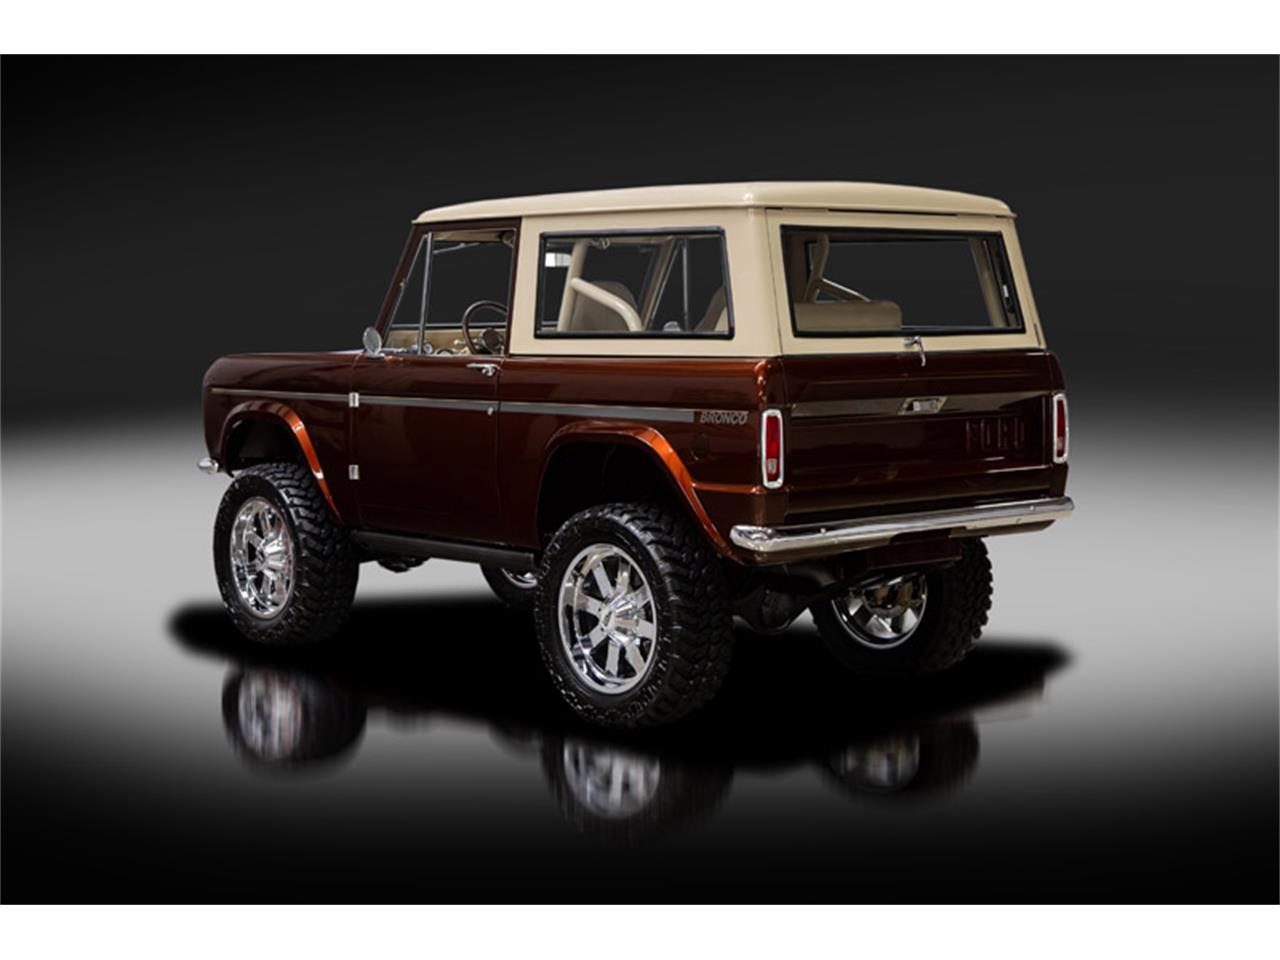 1977 Ford Bronco (CC-1274440) for sale in Seekonk, Massachusetts